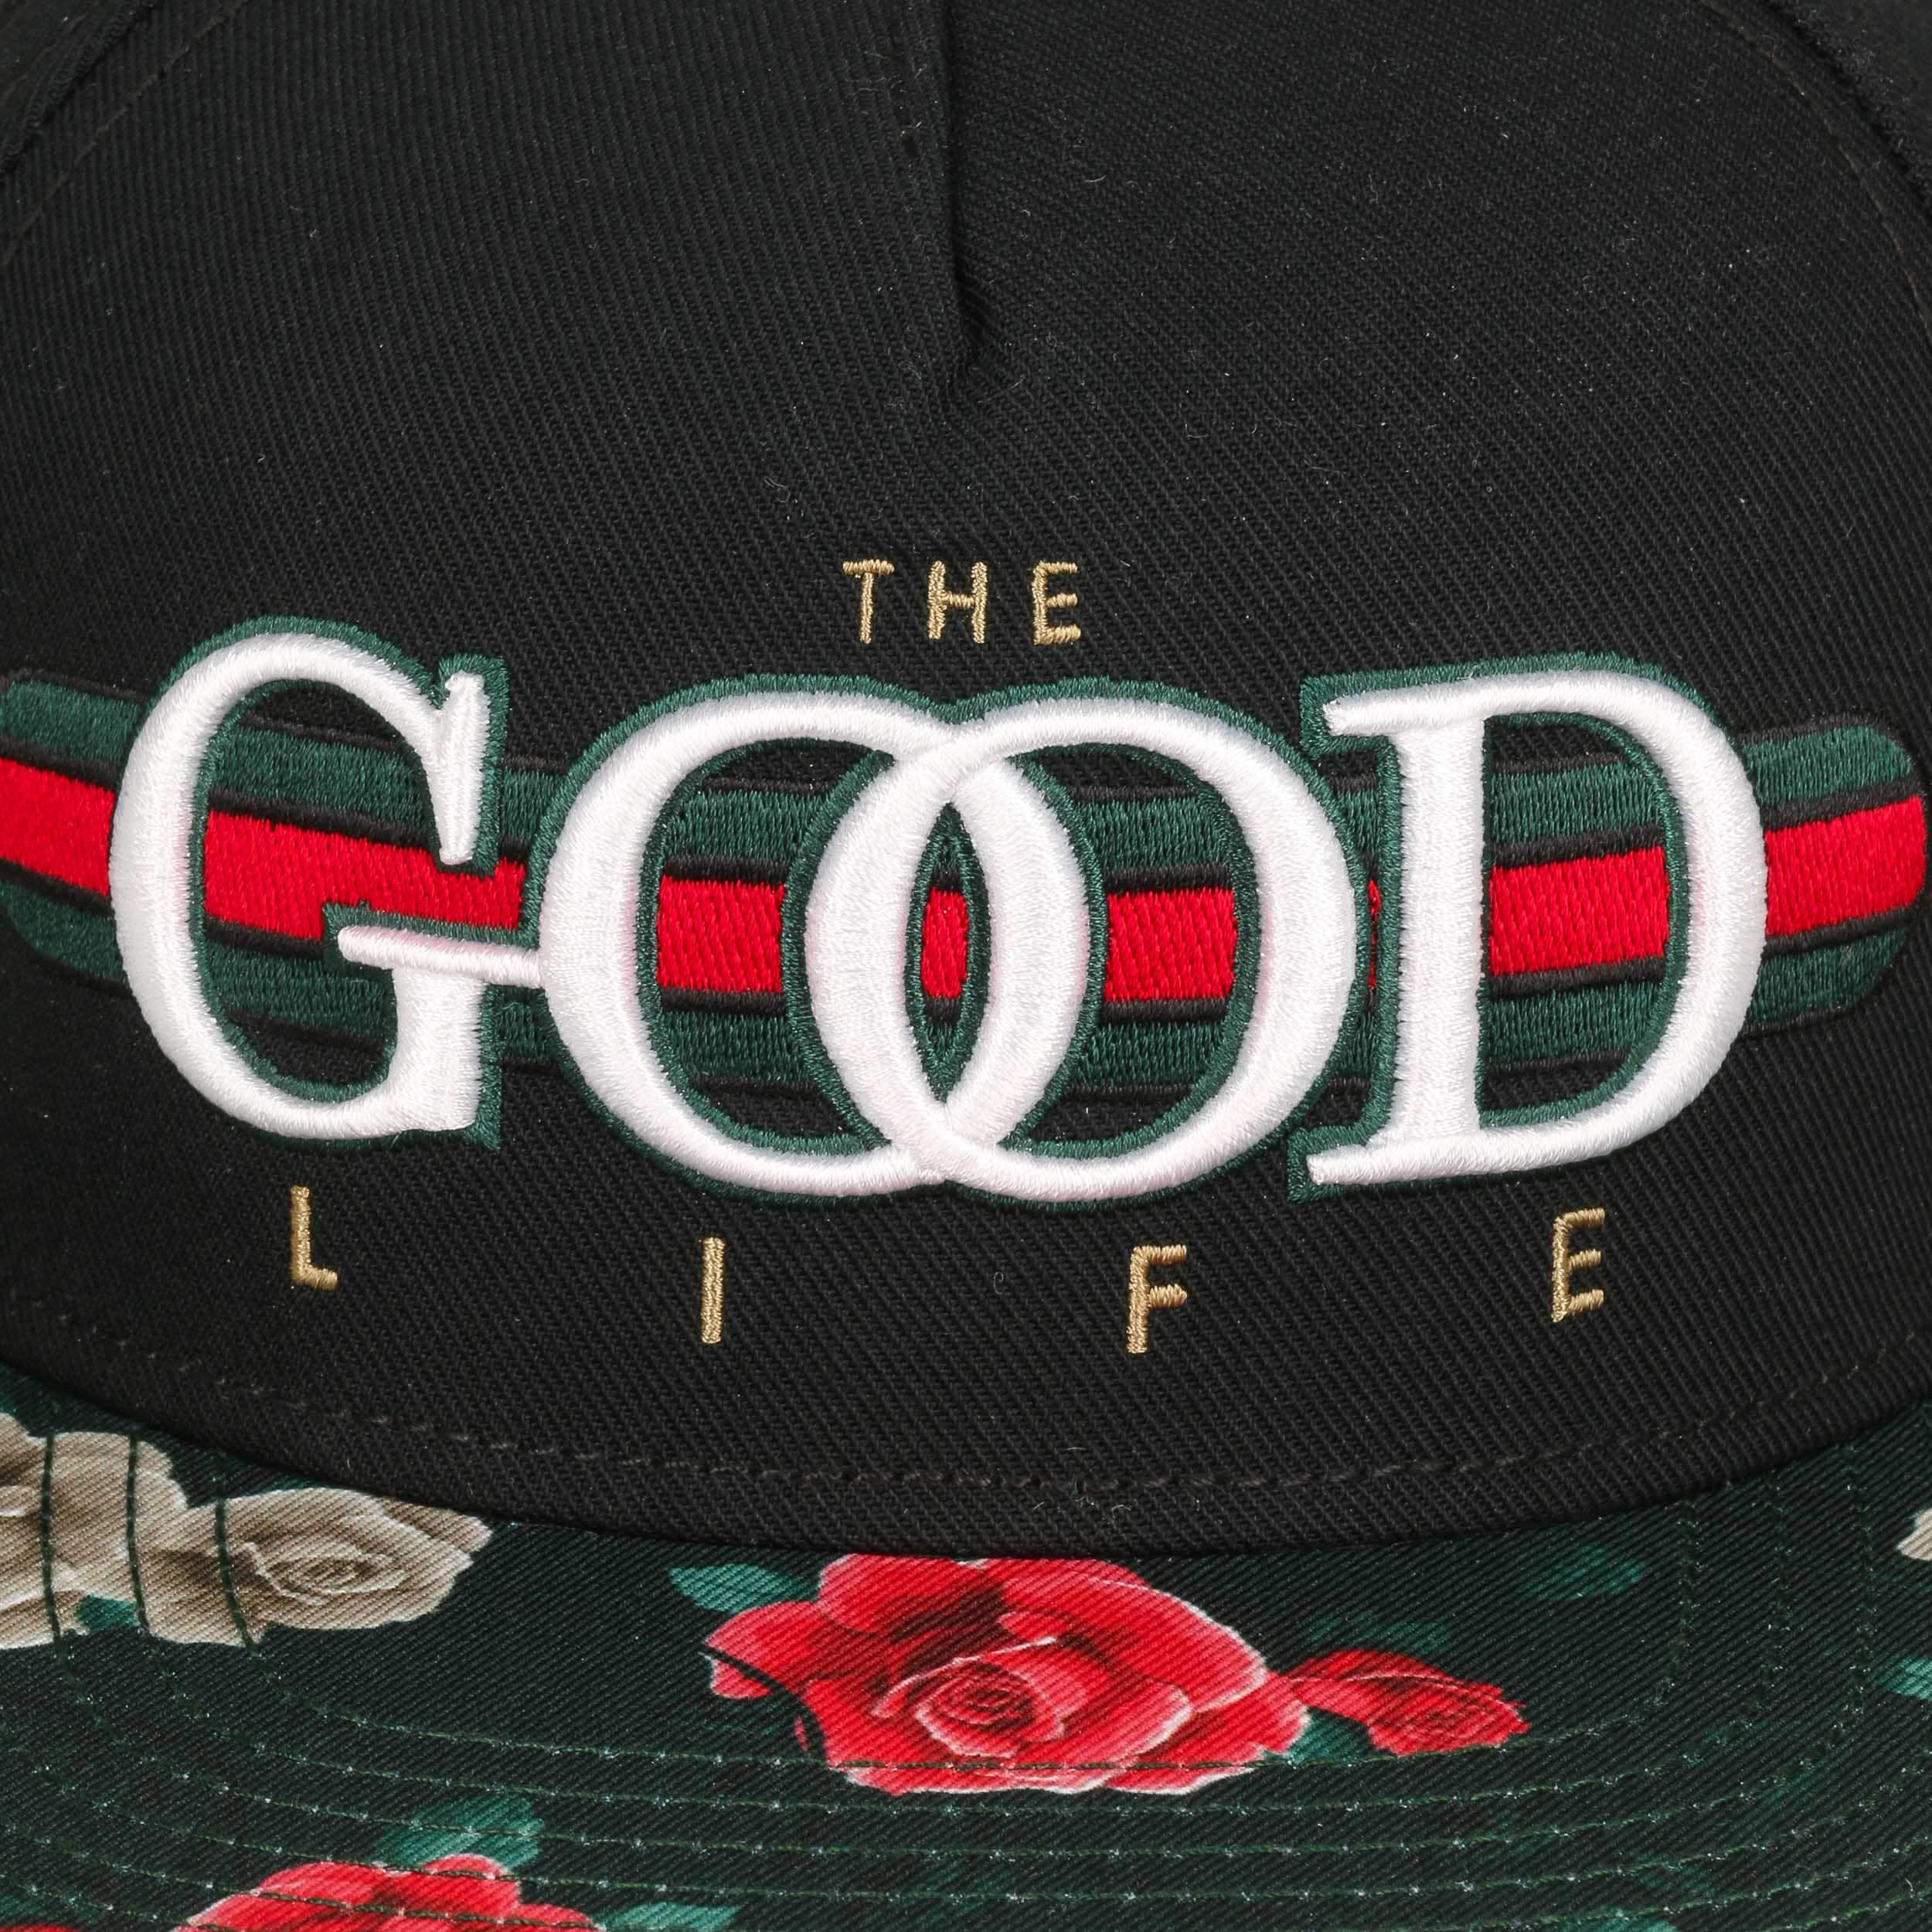 ... Good Life Snapback Cap by Cayler   Sons - black 4 ... 6d8203e401b5